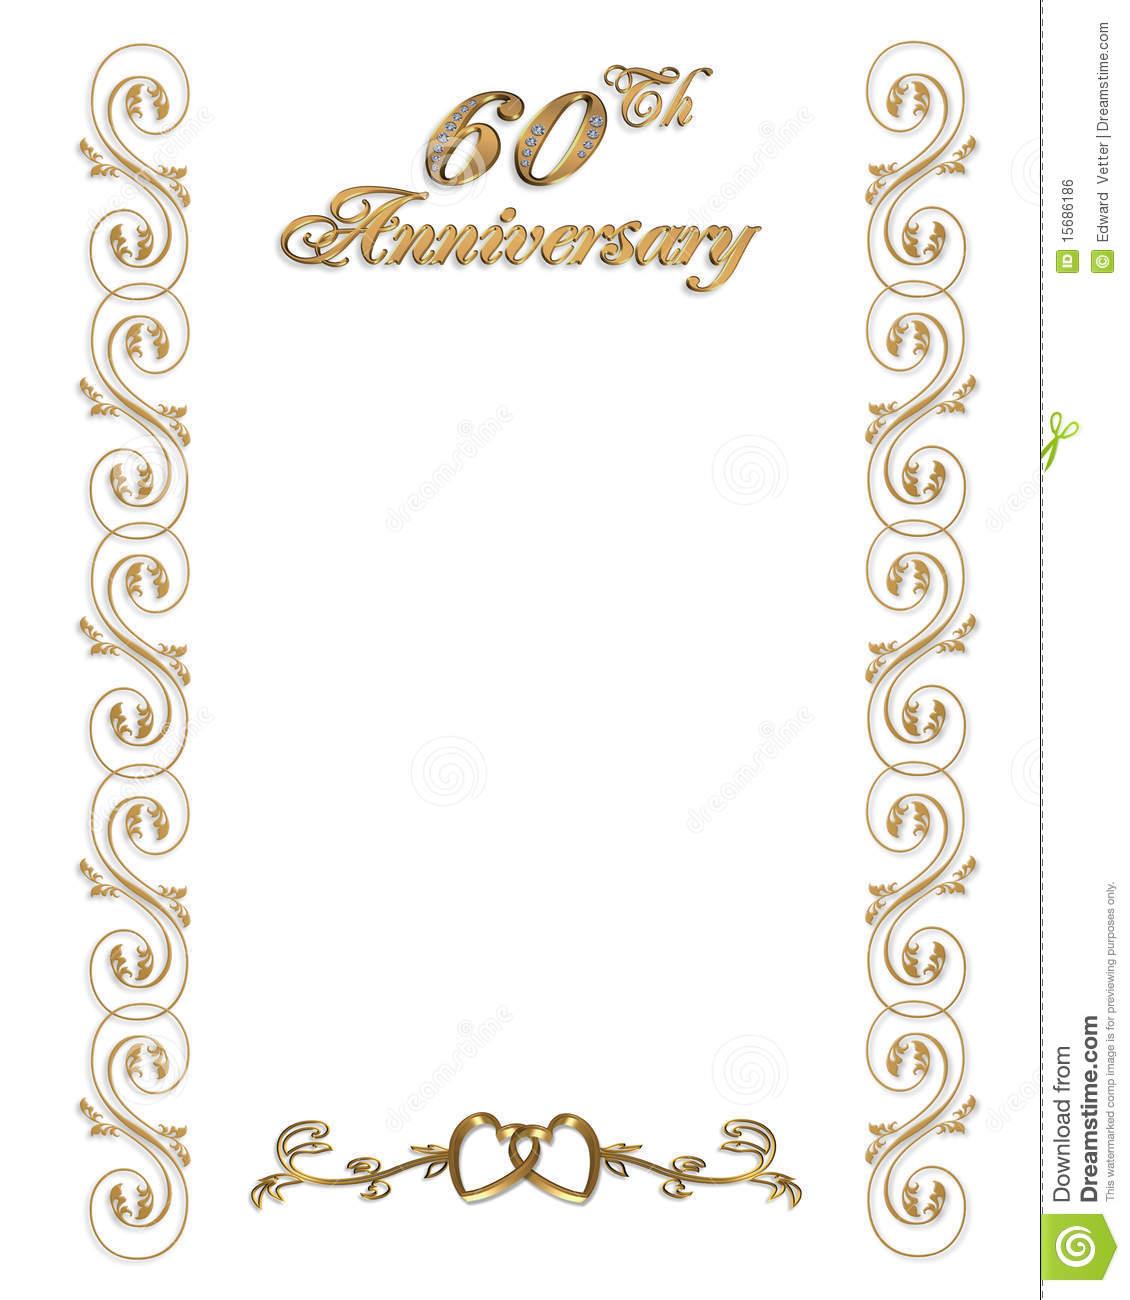 60th Wedding Anniversary Clipart.